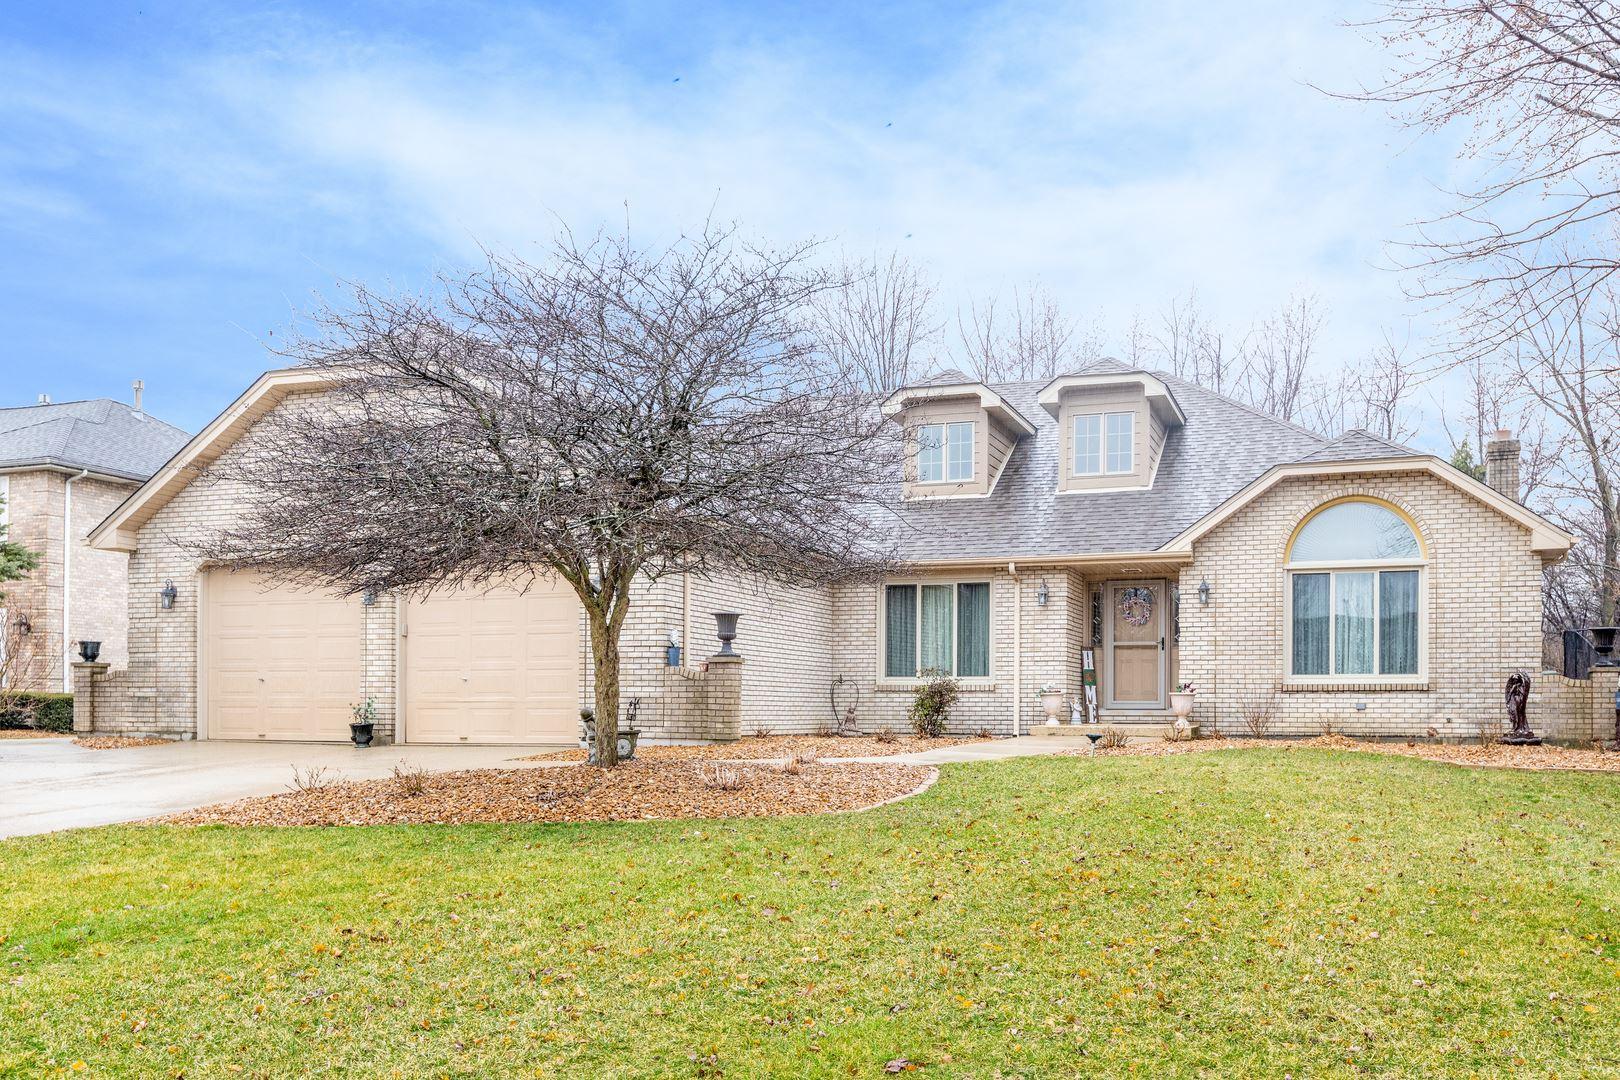 15048 S Woodcrest Avenue, Homer Glen, IL 60491 - #: 10780812